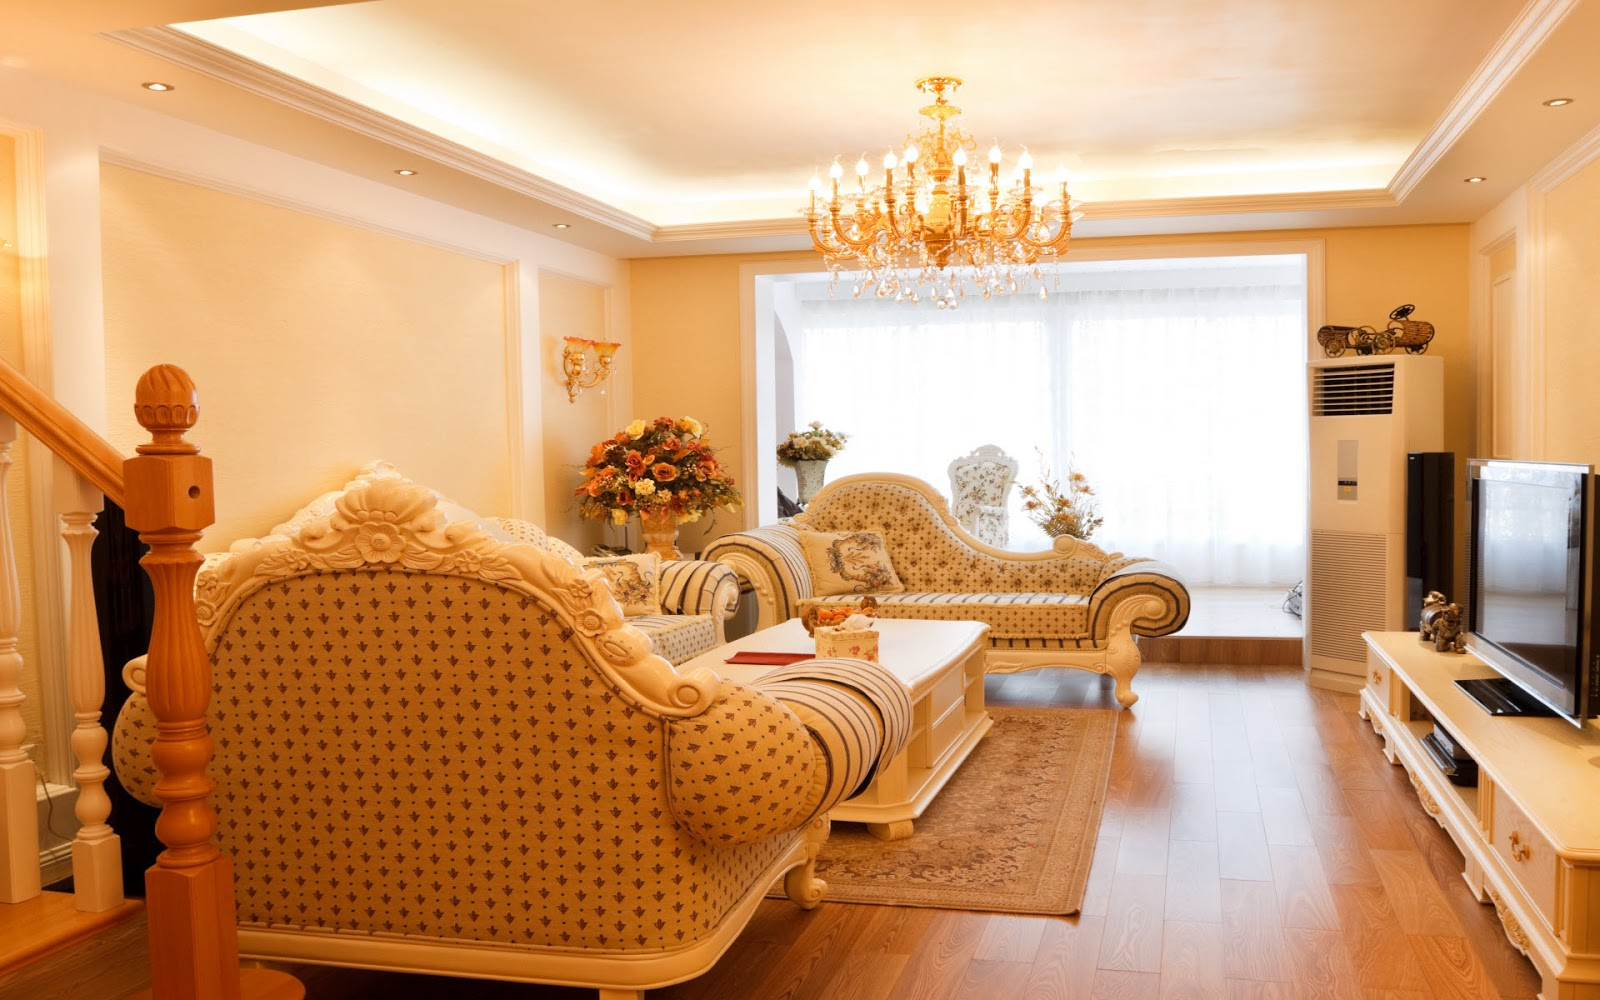 Interior design hd wallpapers - Wallpaper interior design pictures ...